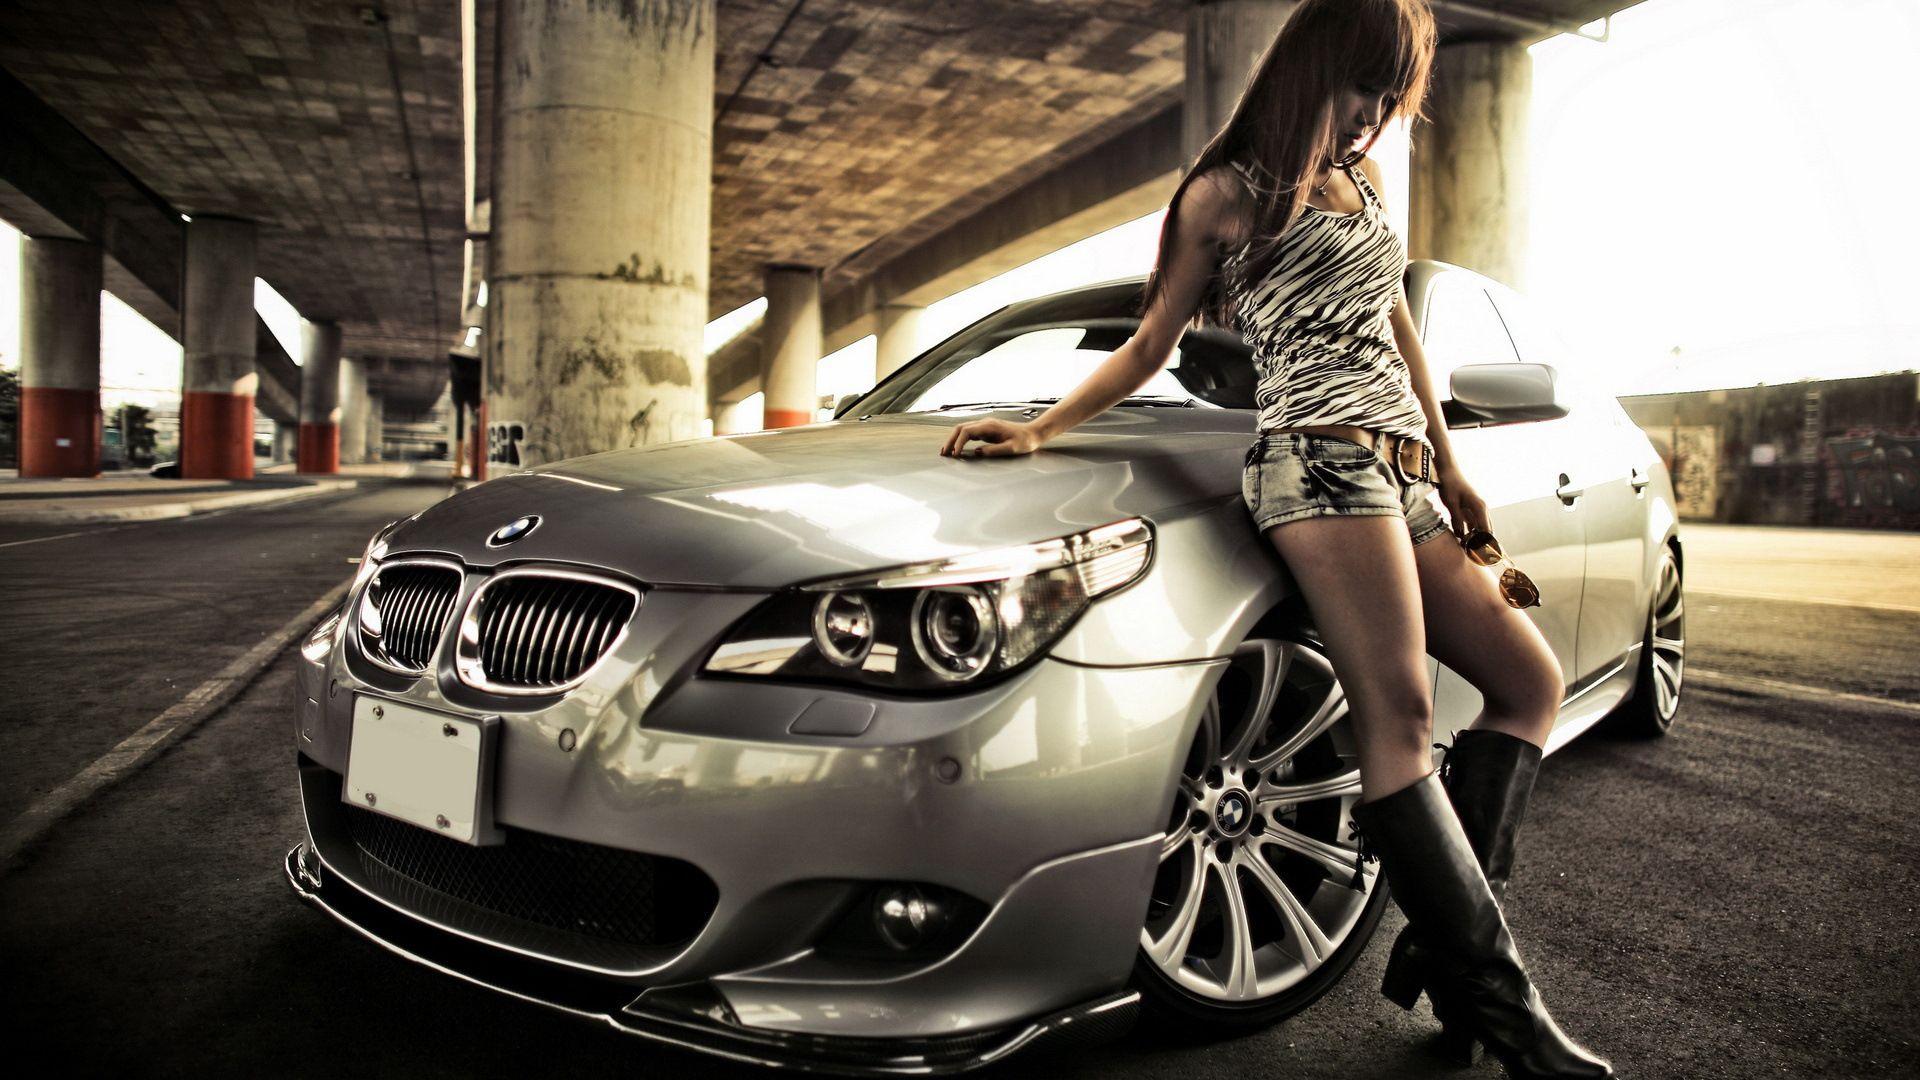 Car Girl hd wallpaper